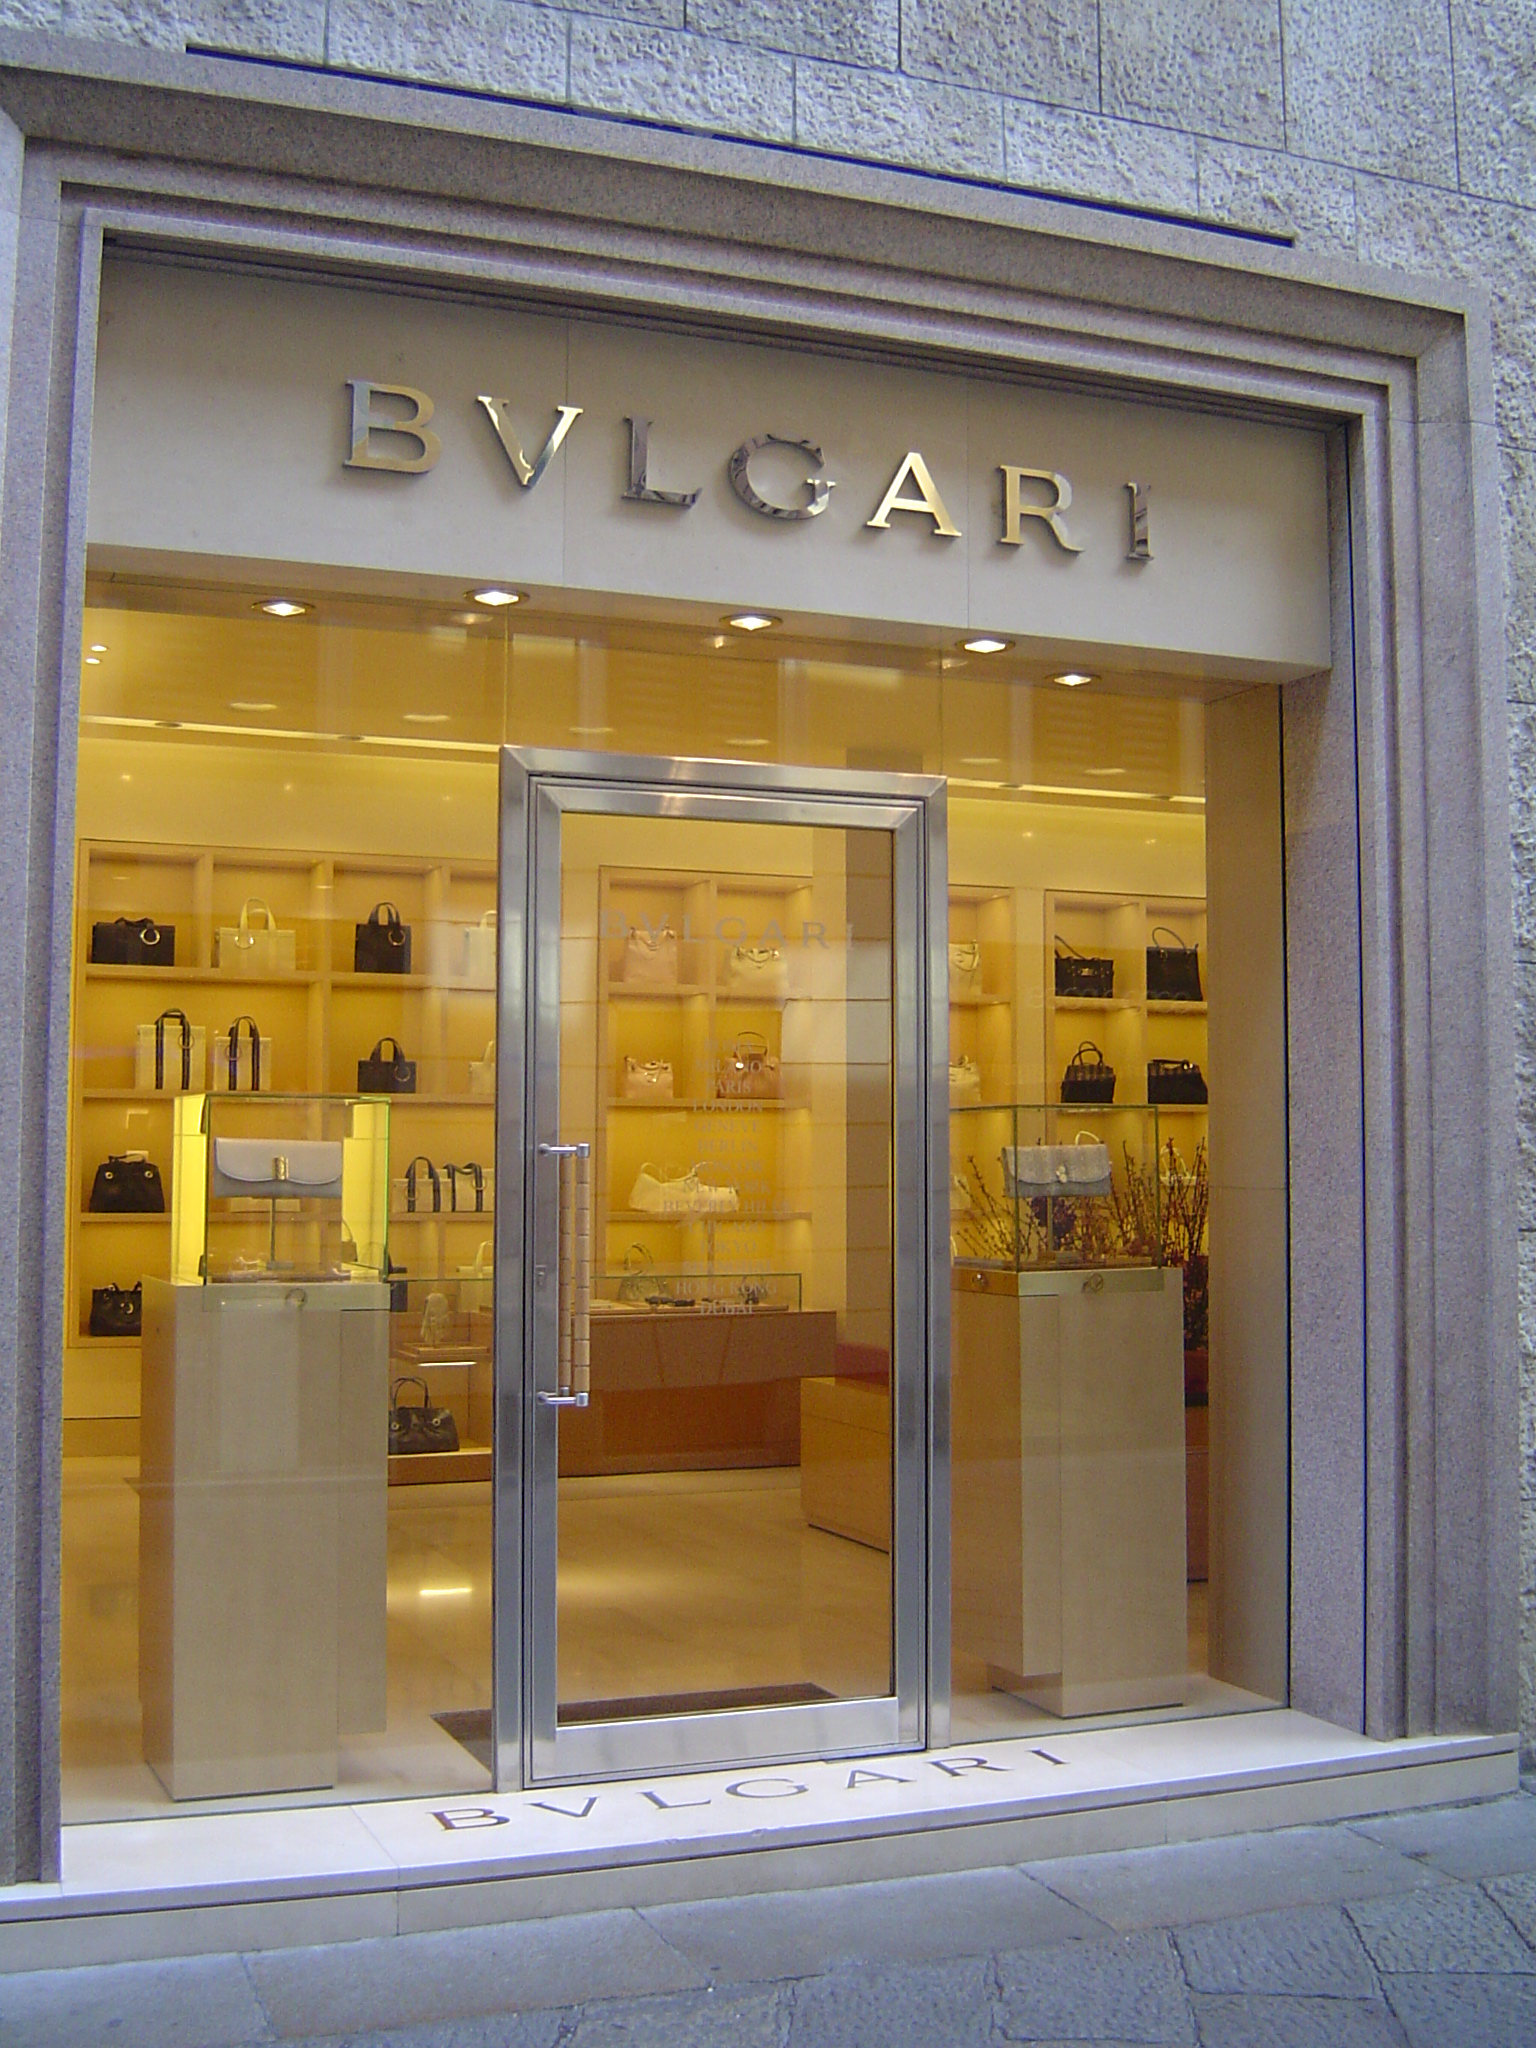 dbeff71189761 Bulgari Stores - SkyscraperCity